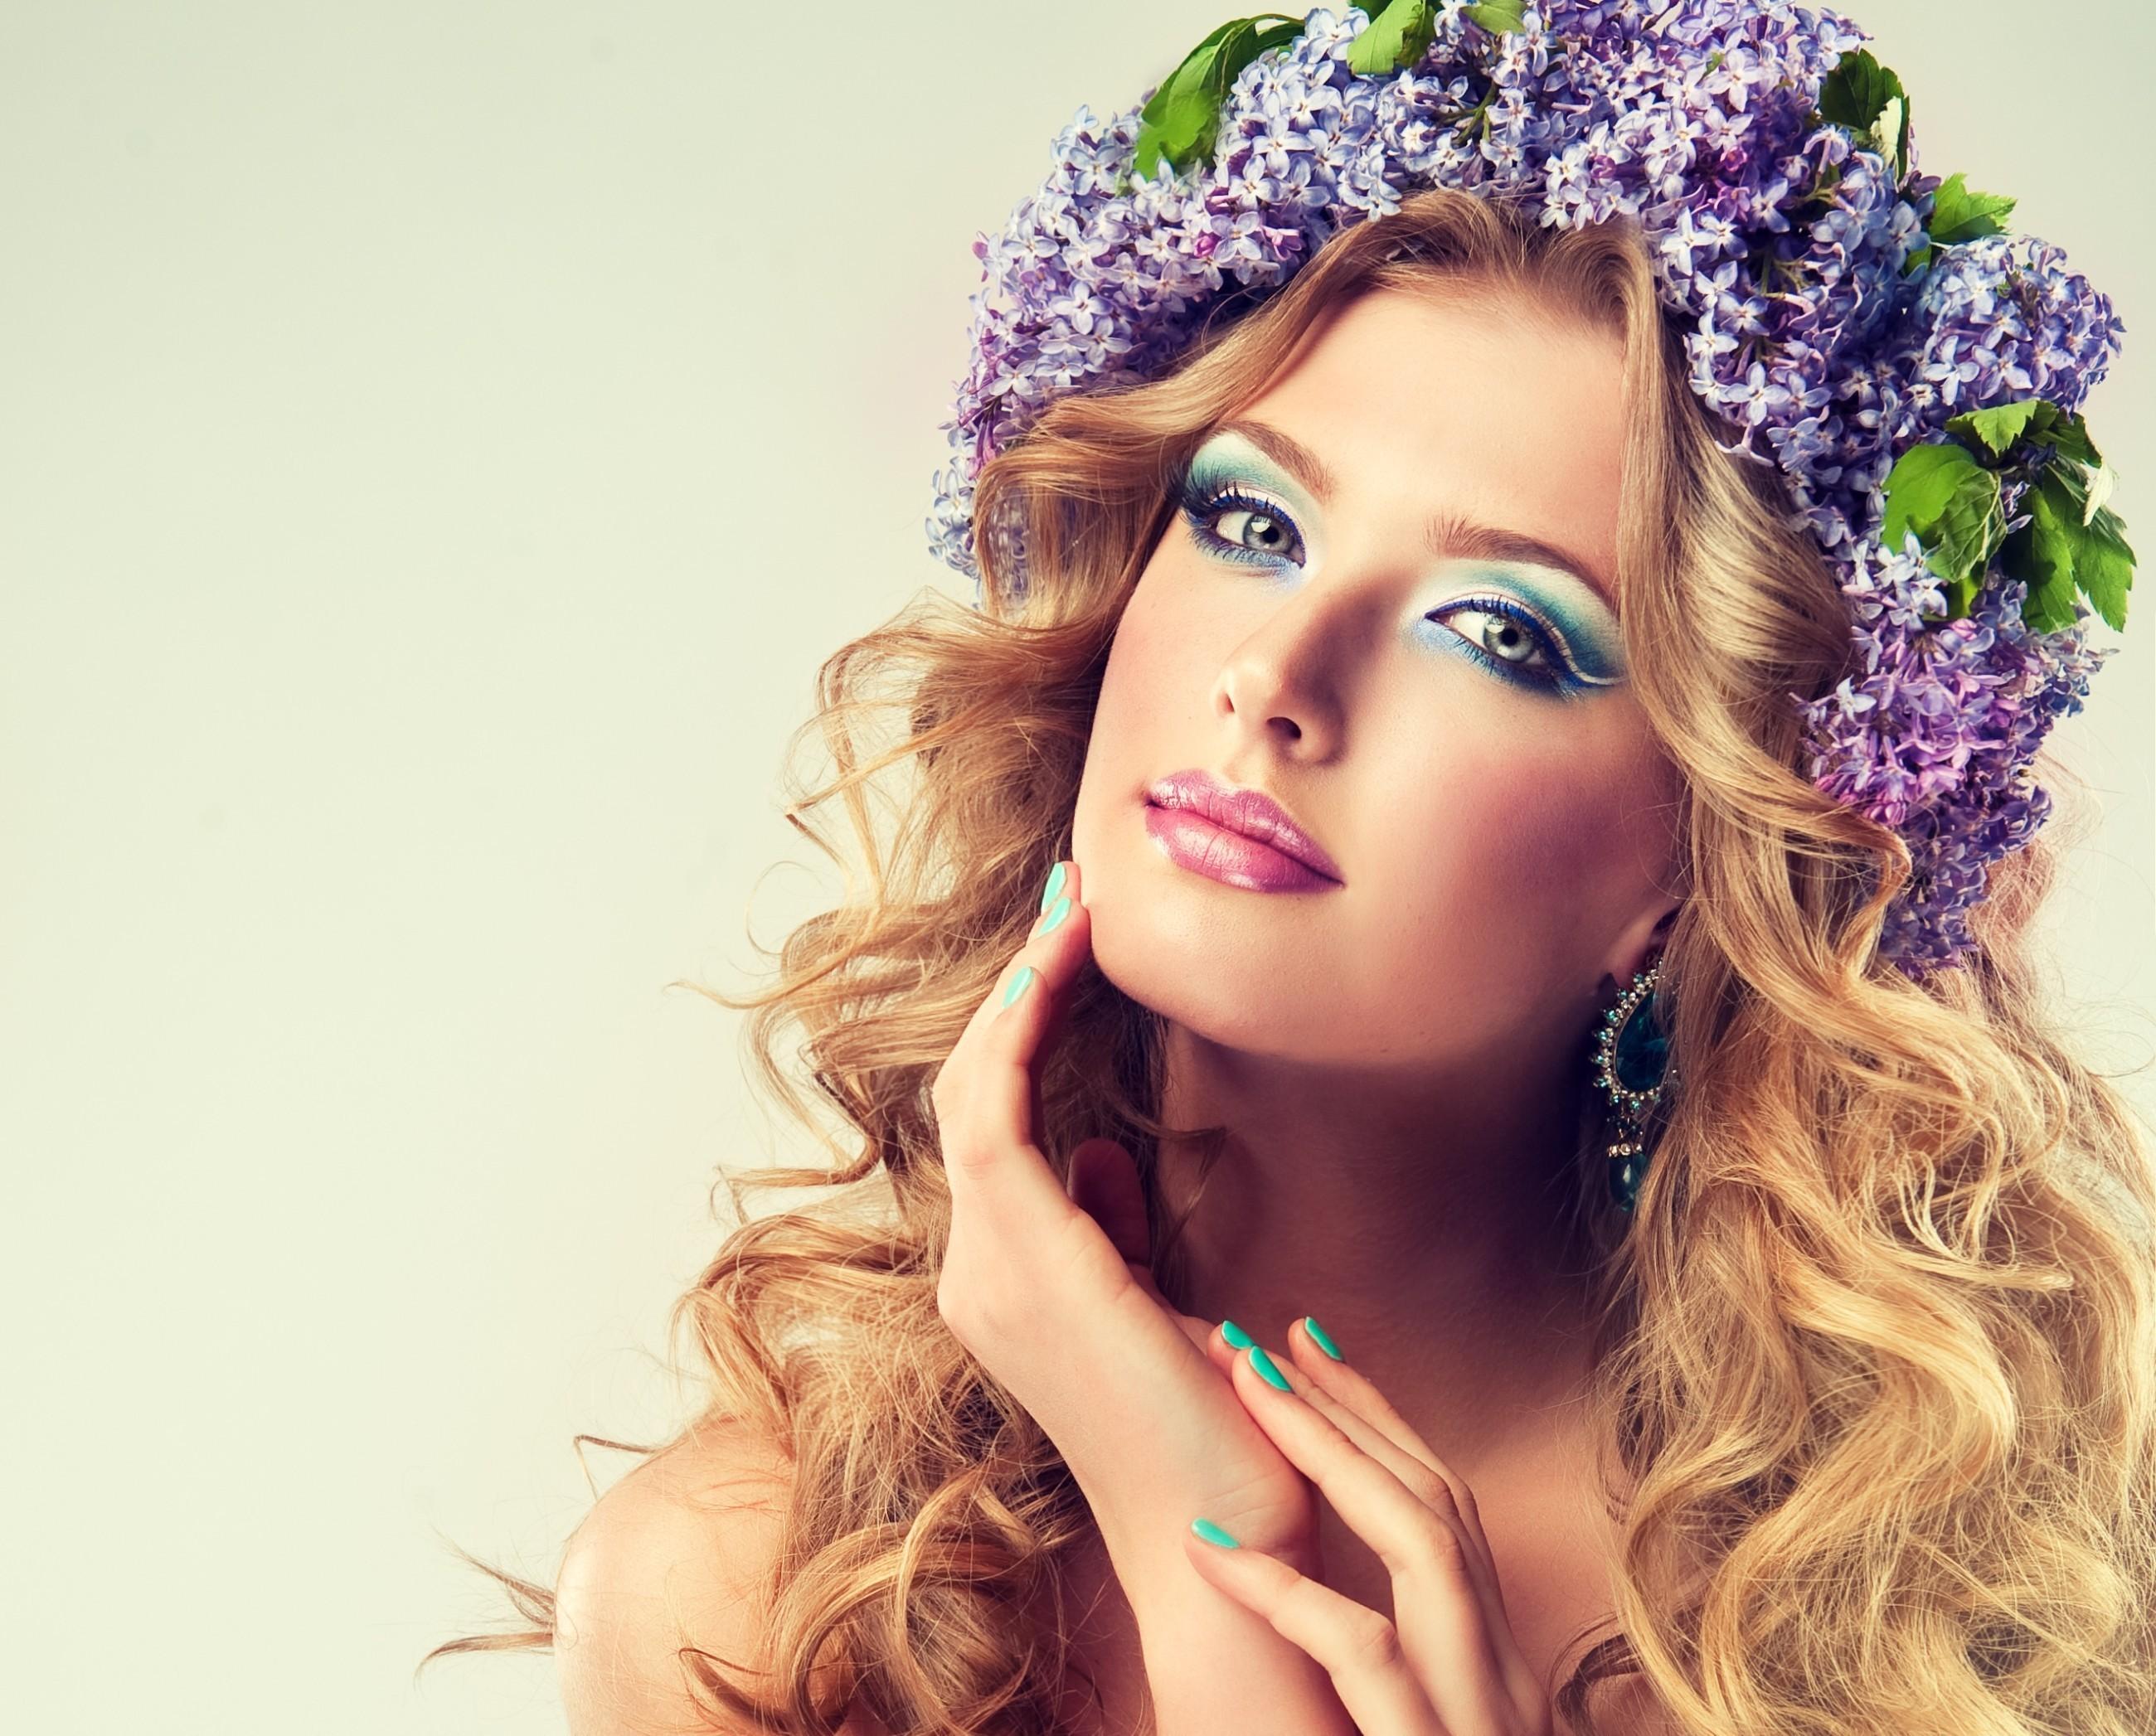 Women – Face Curl Hair Lilac Wreath Model Girl Wallpaper